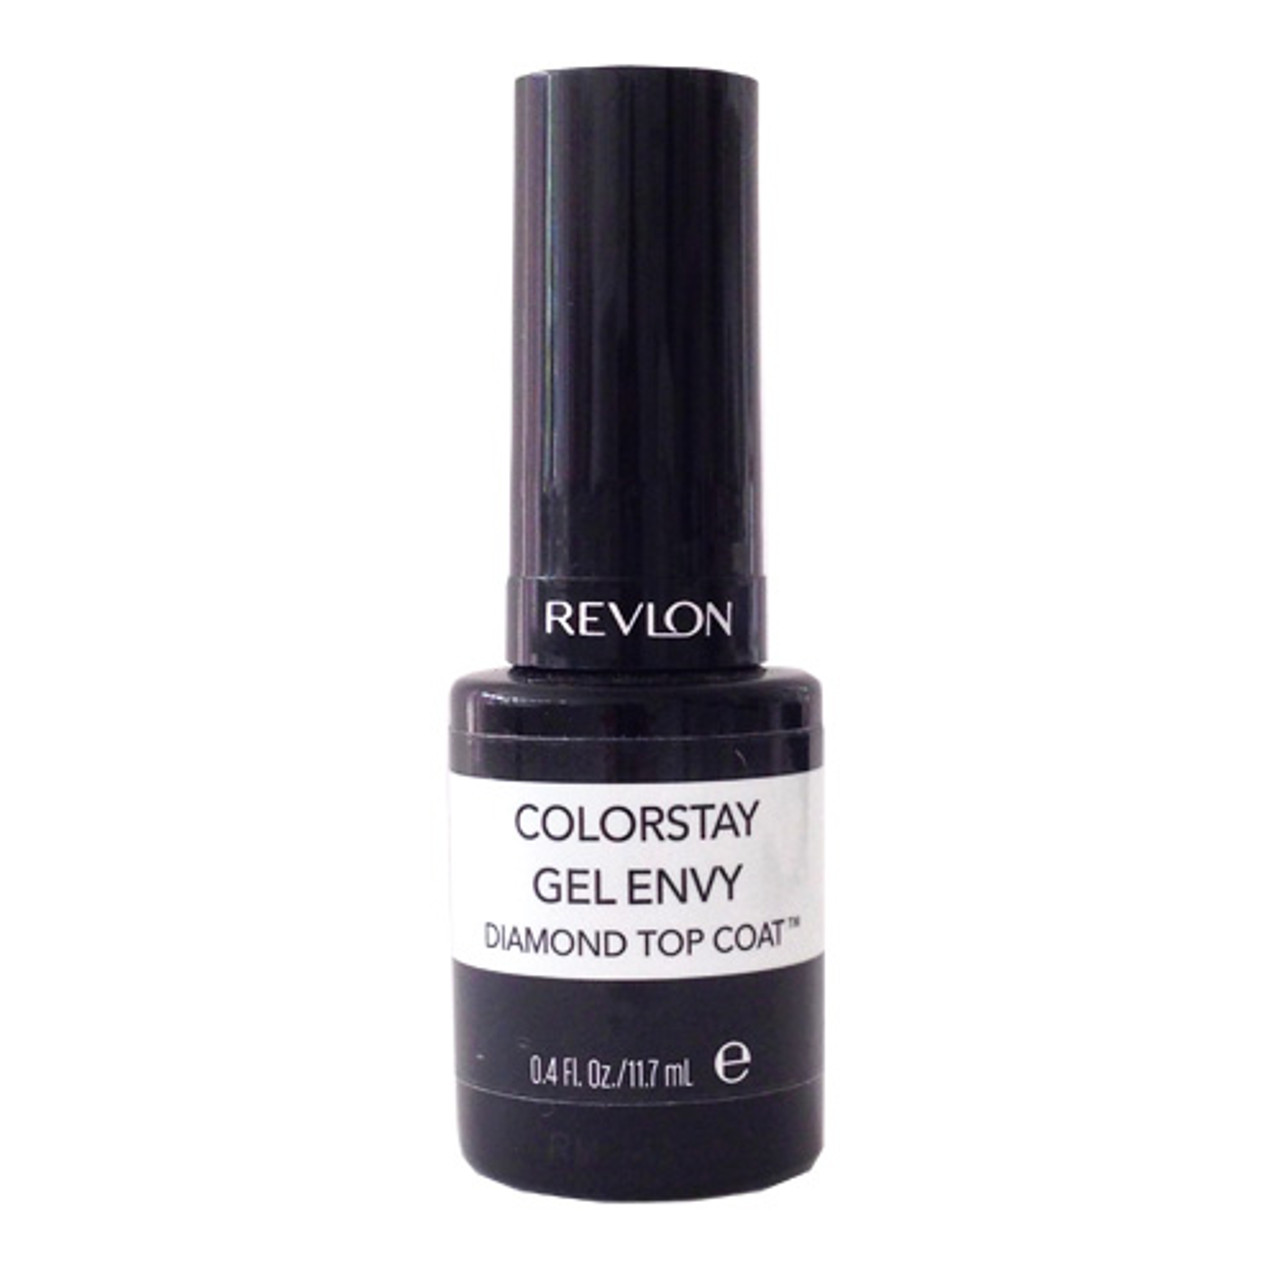 Revlon Colorstay Gel Envy Diamond Top Coat - BuyMeBeauty.com